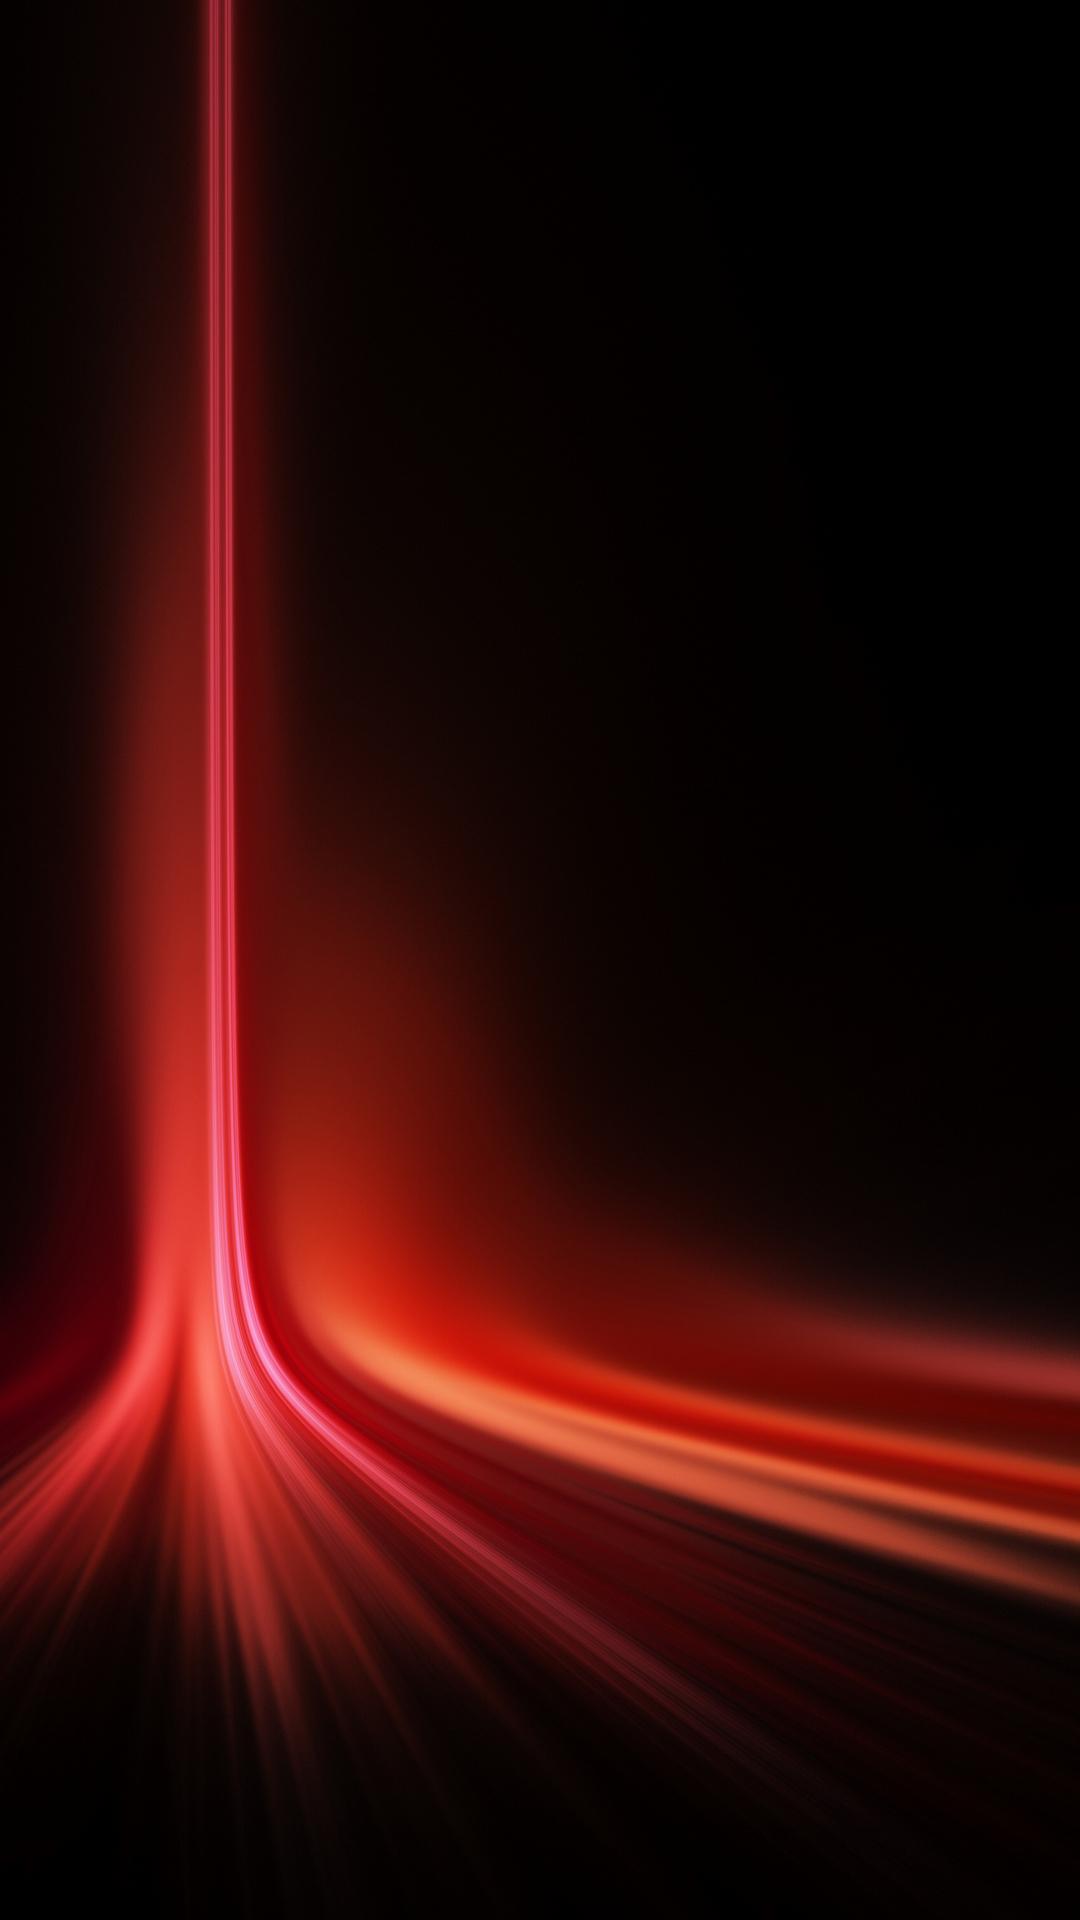 laser wallpaper iphone